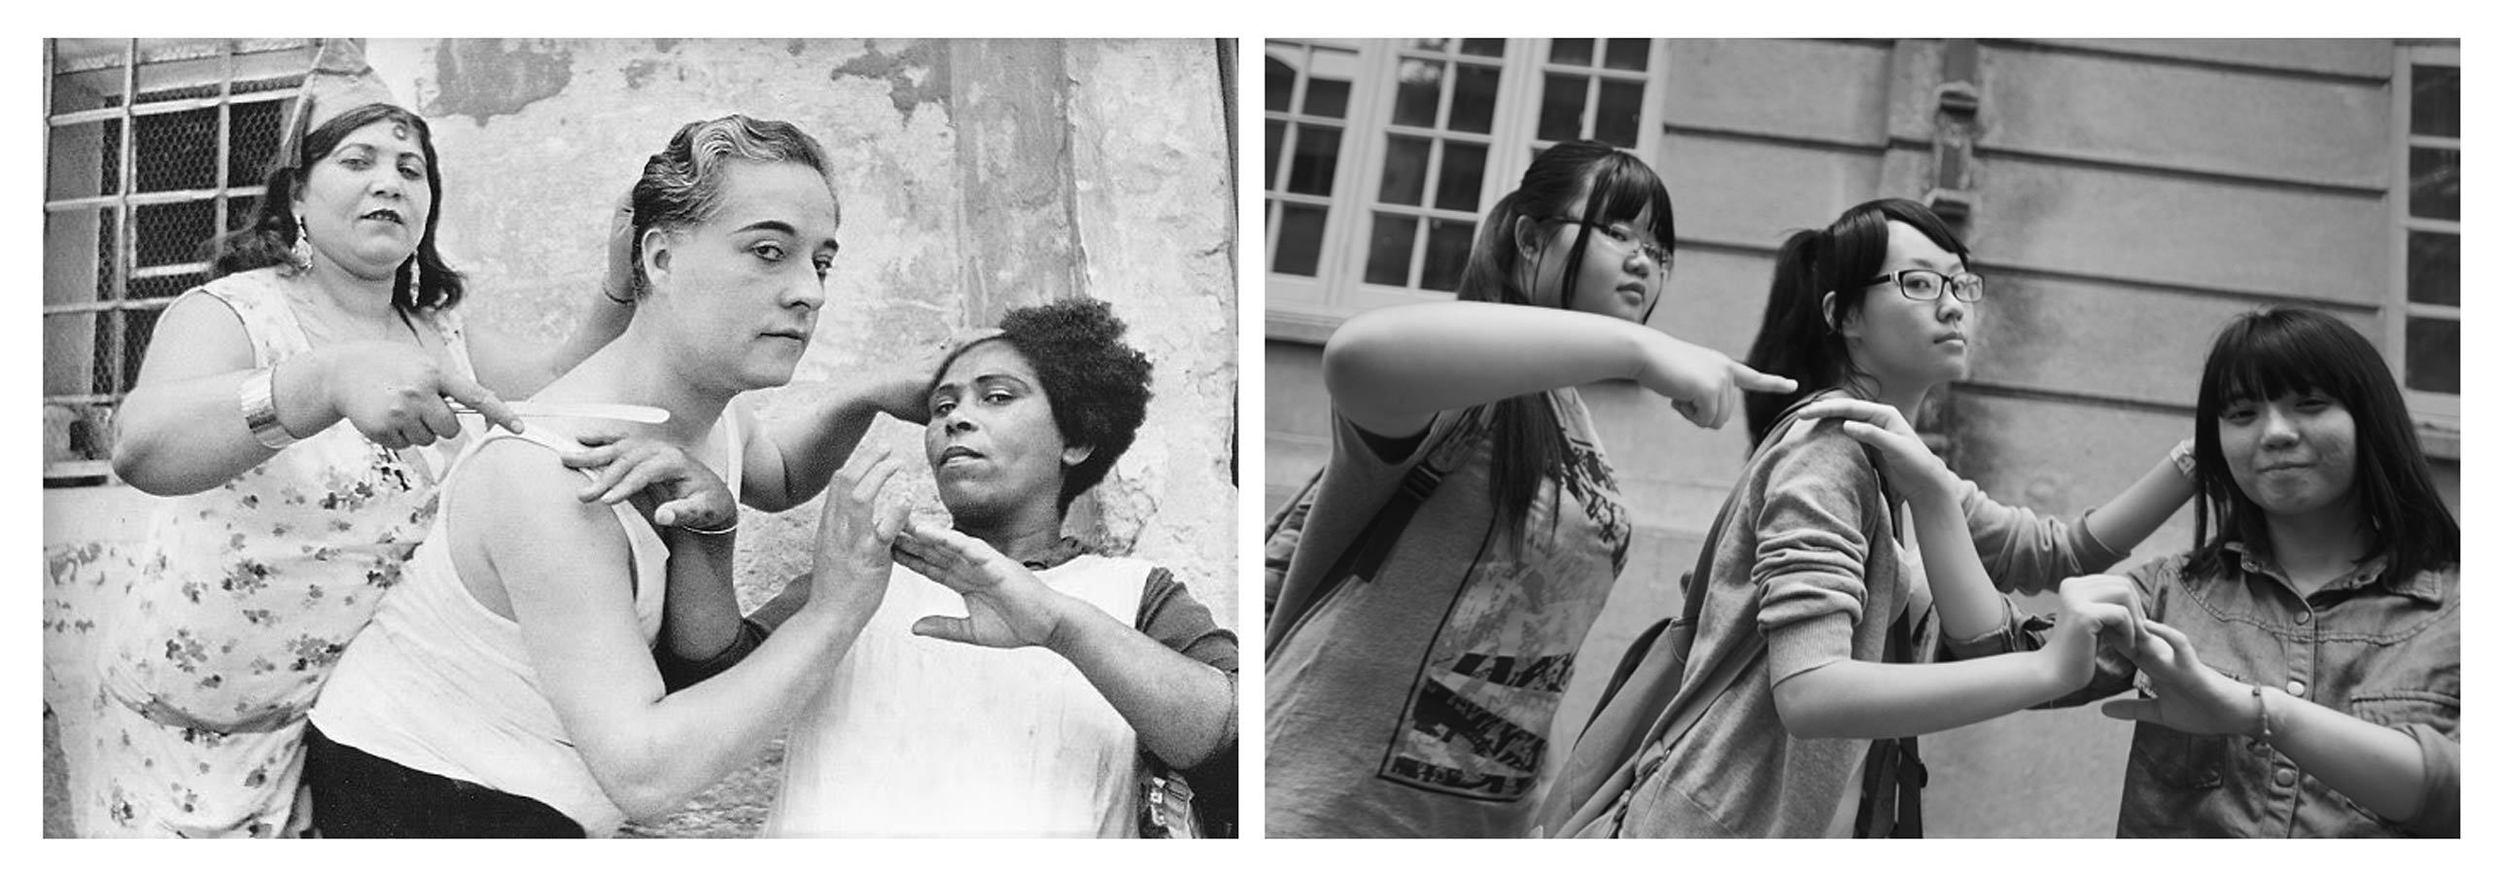 Cartier-Bresson-Homage_3.jpg